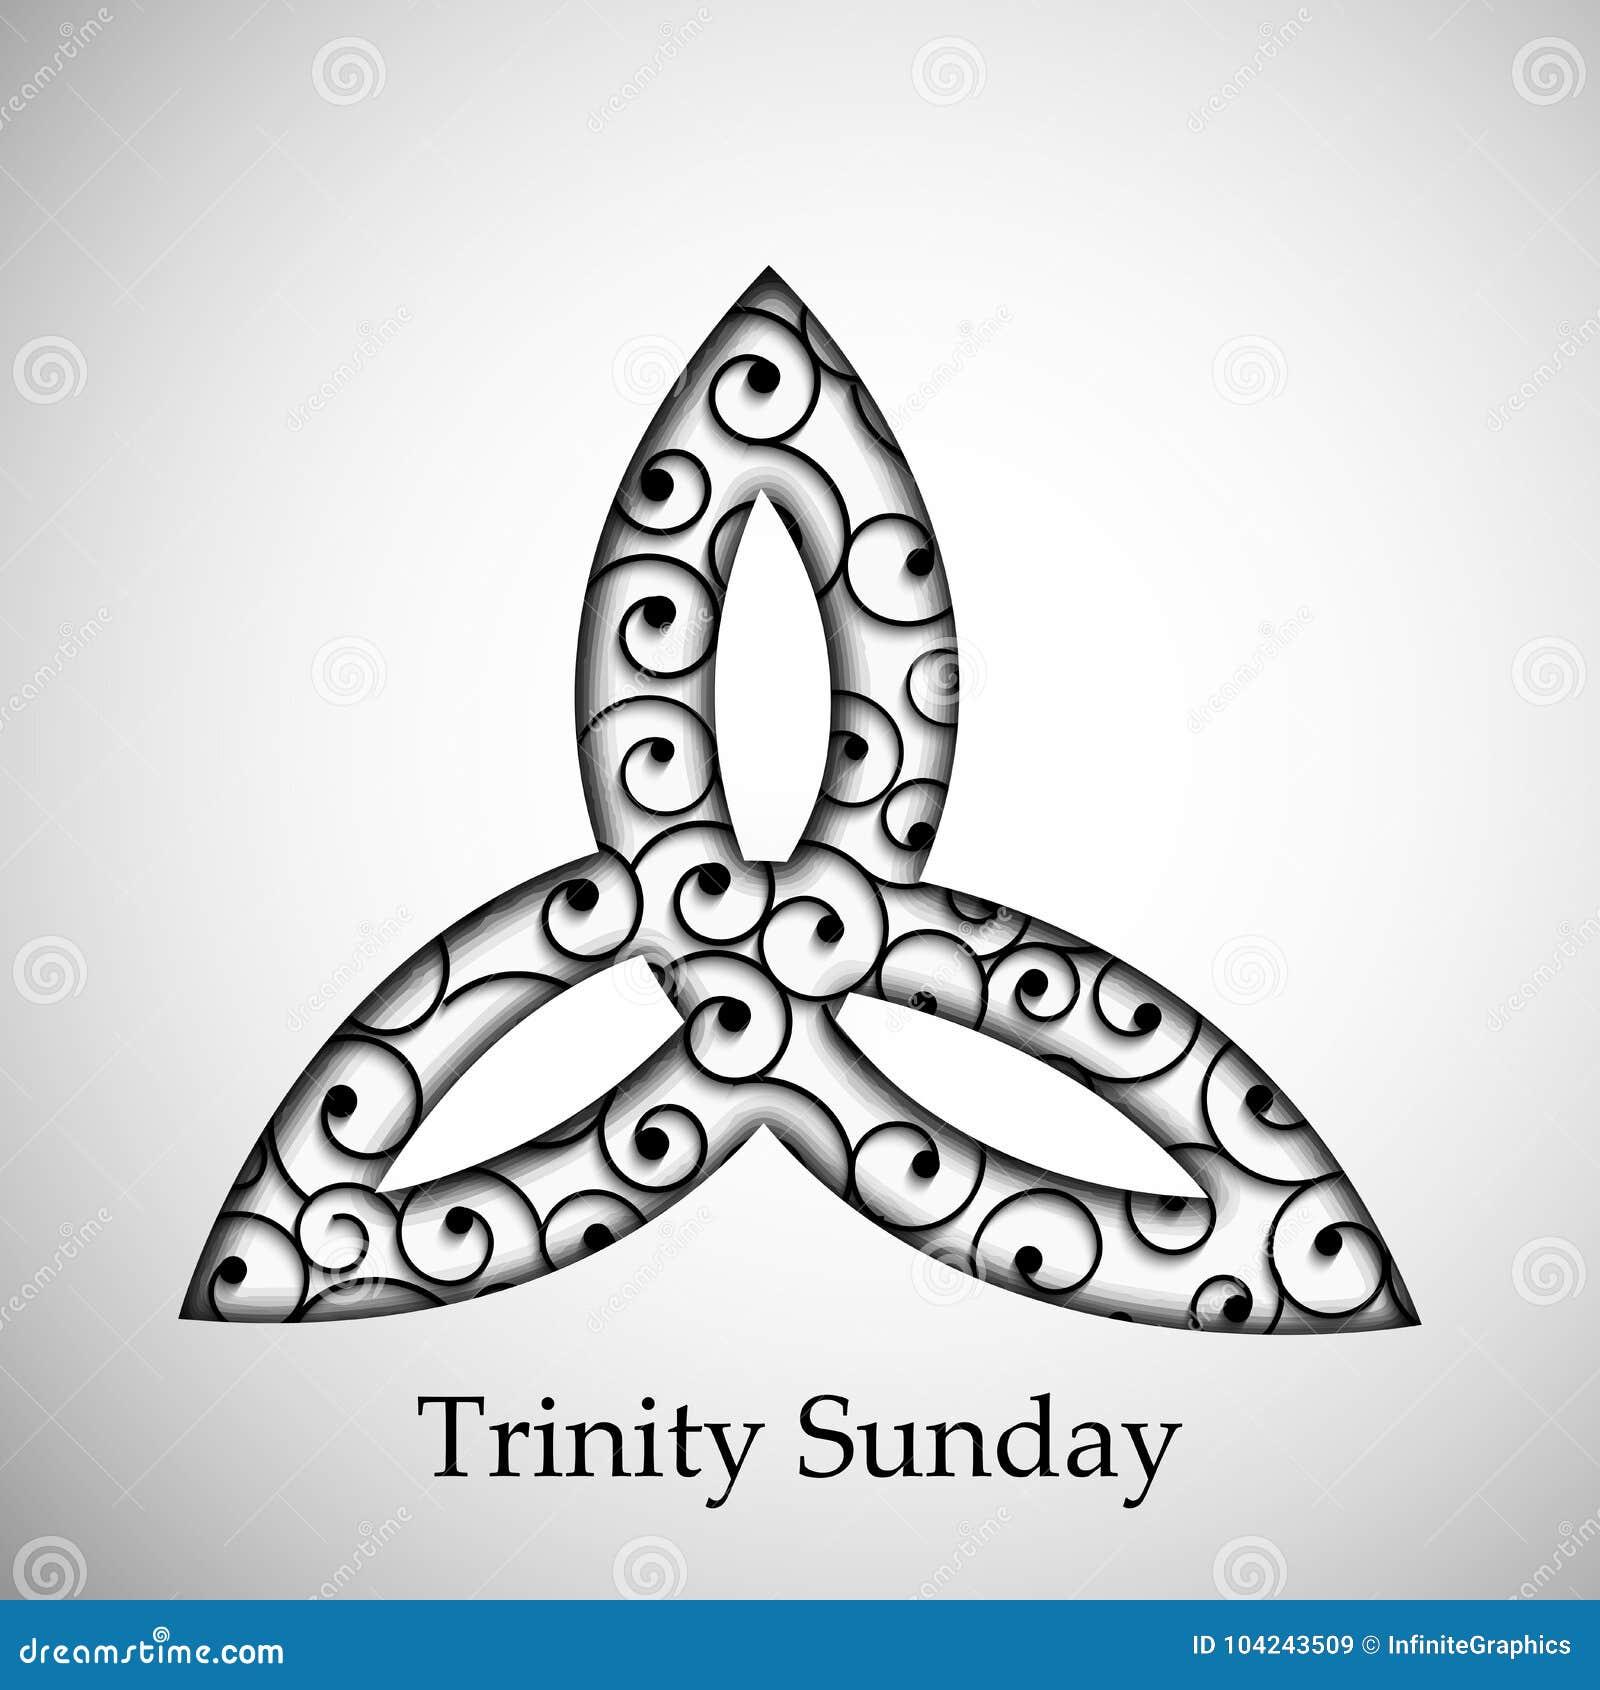 Illustration Of Trinity Sunday Background Stock Vector